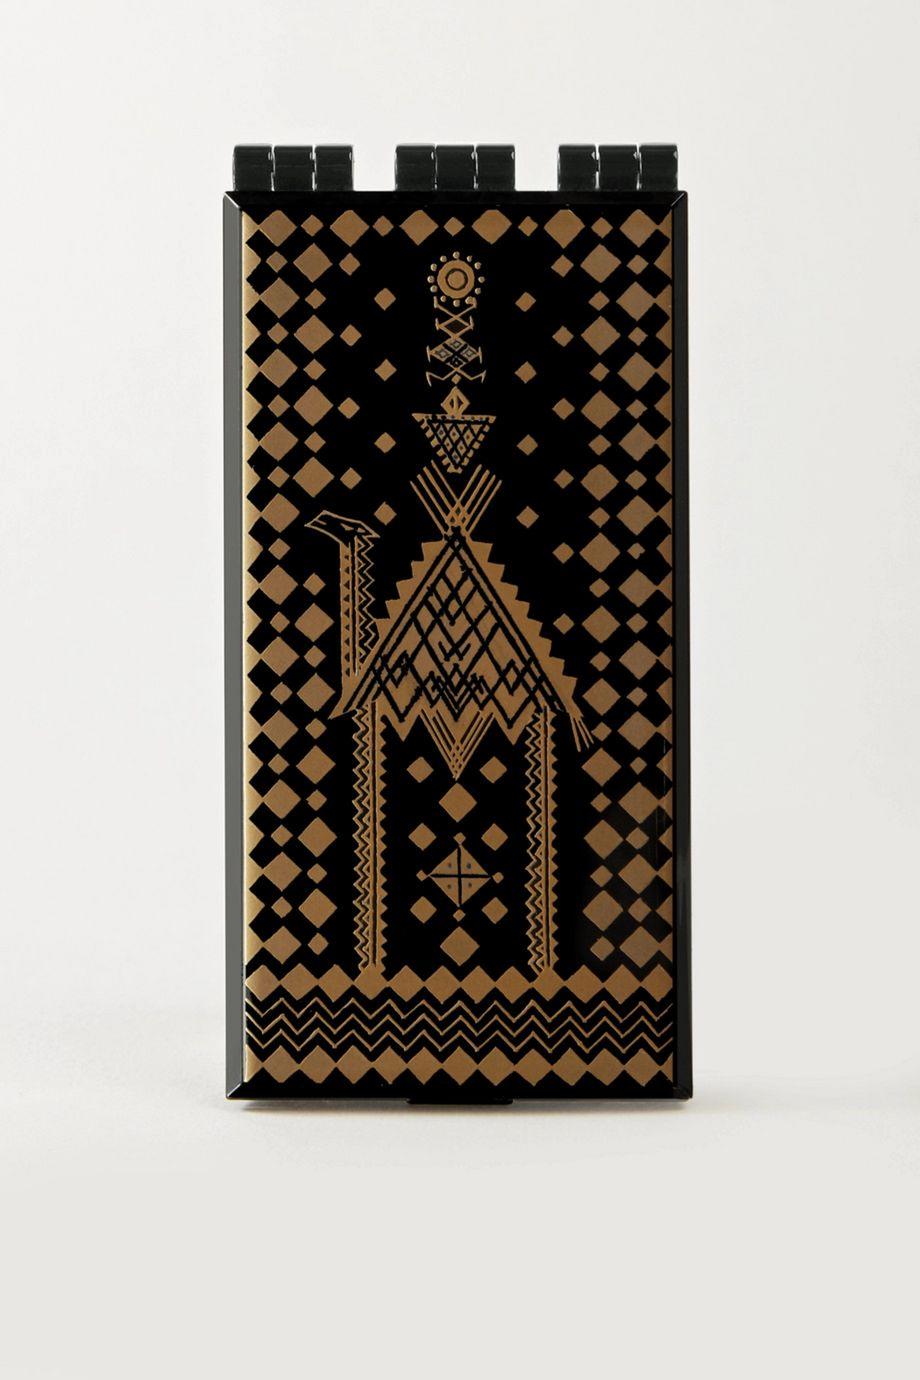 Serge Lutens Lacquered Powder Case – Gold/Black – Puderdose